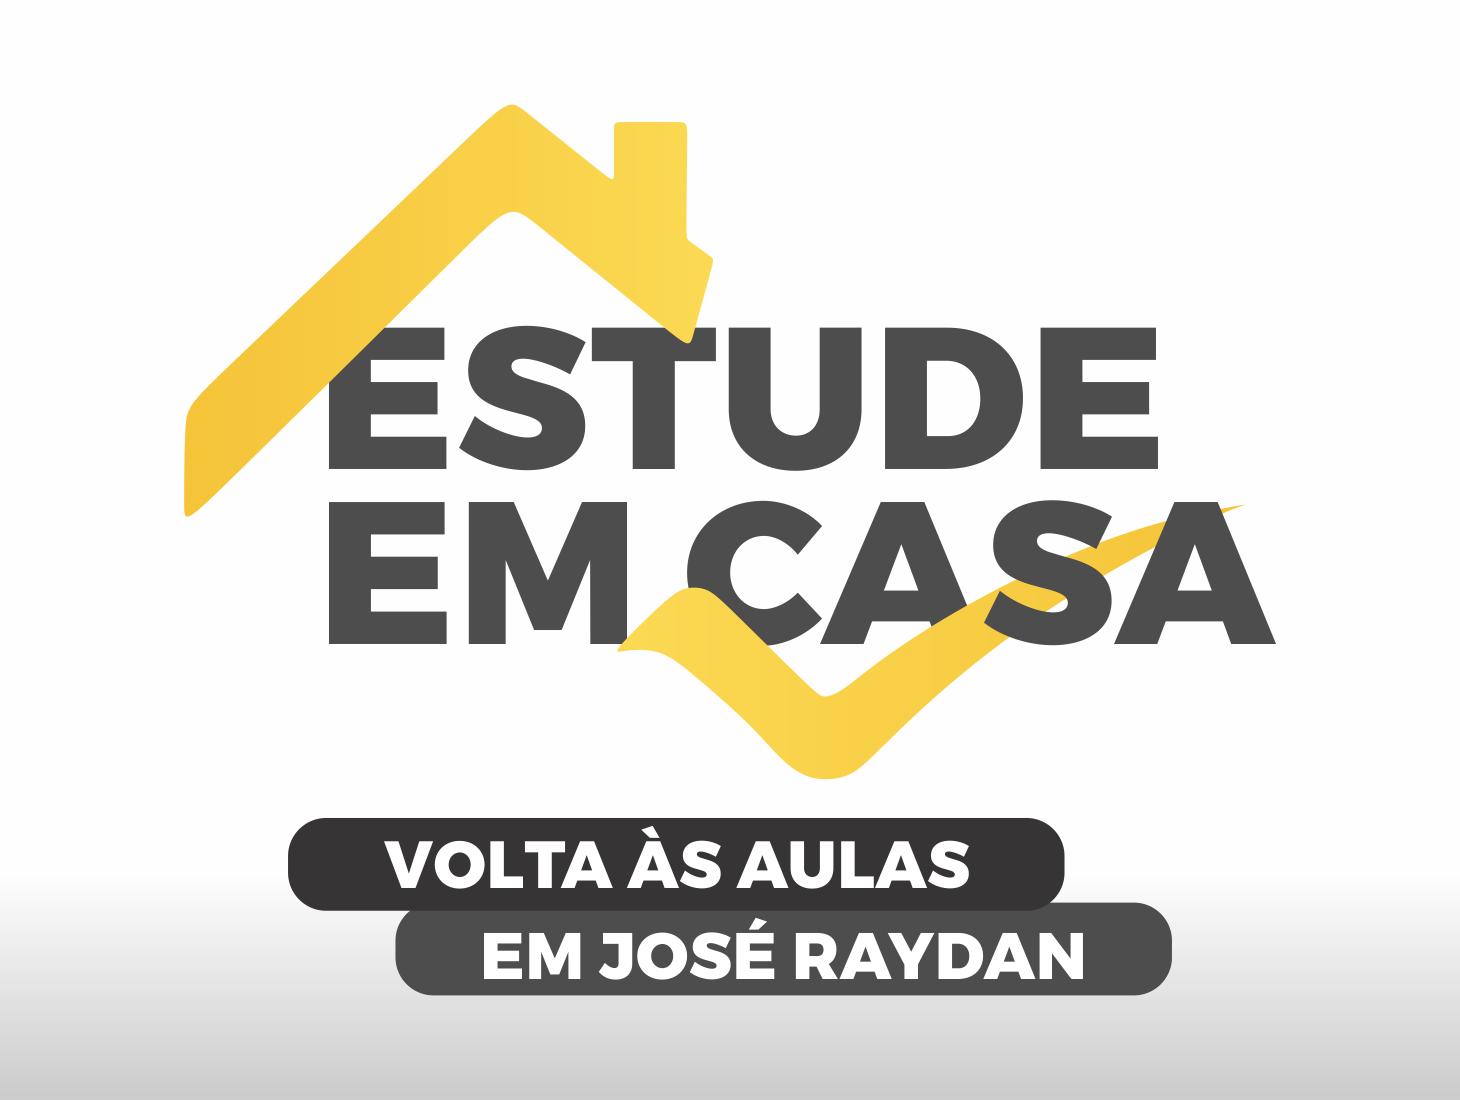 EDUCAÇÃO: VOLTA ÀS AULAS EM JOSÉ RAYDAN